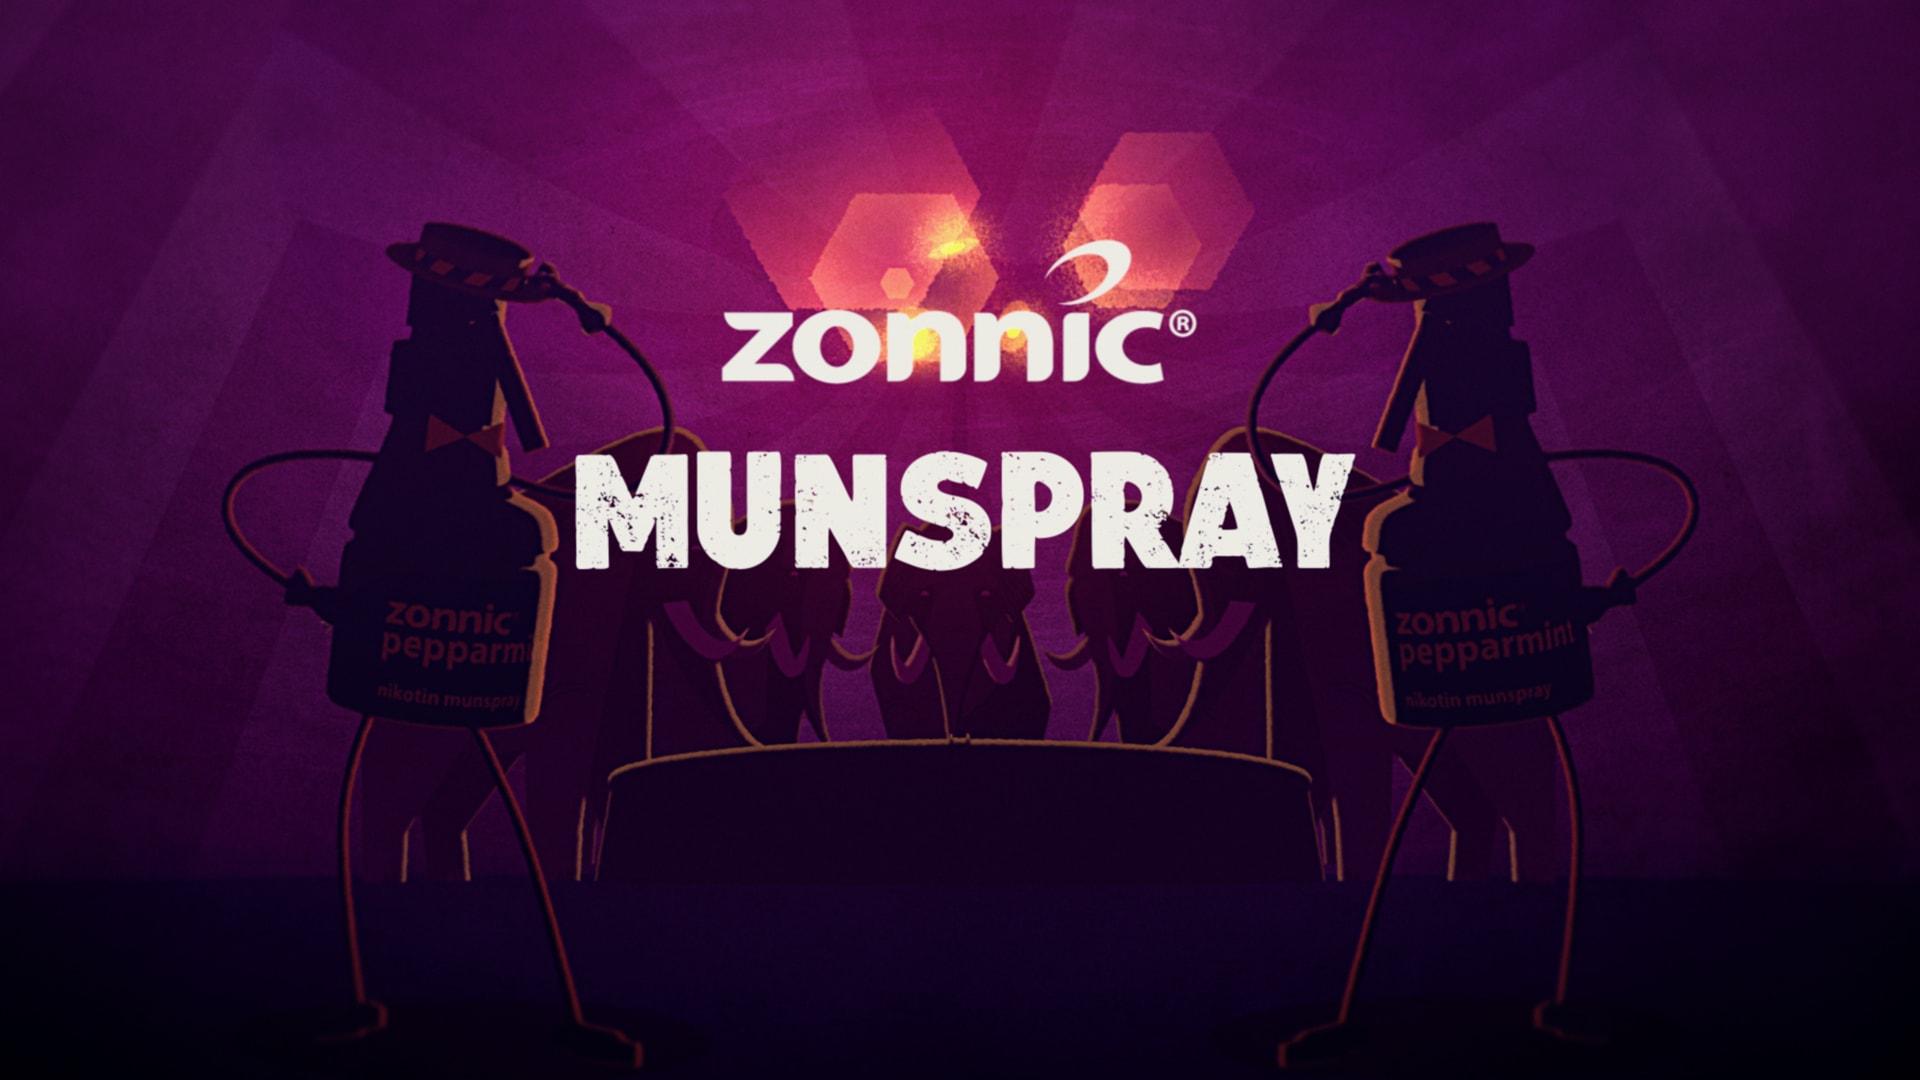 006_zonnic_spray